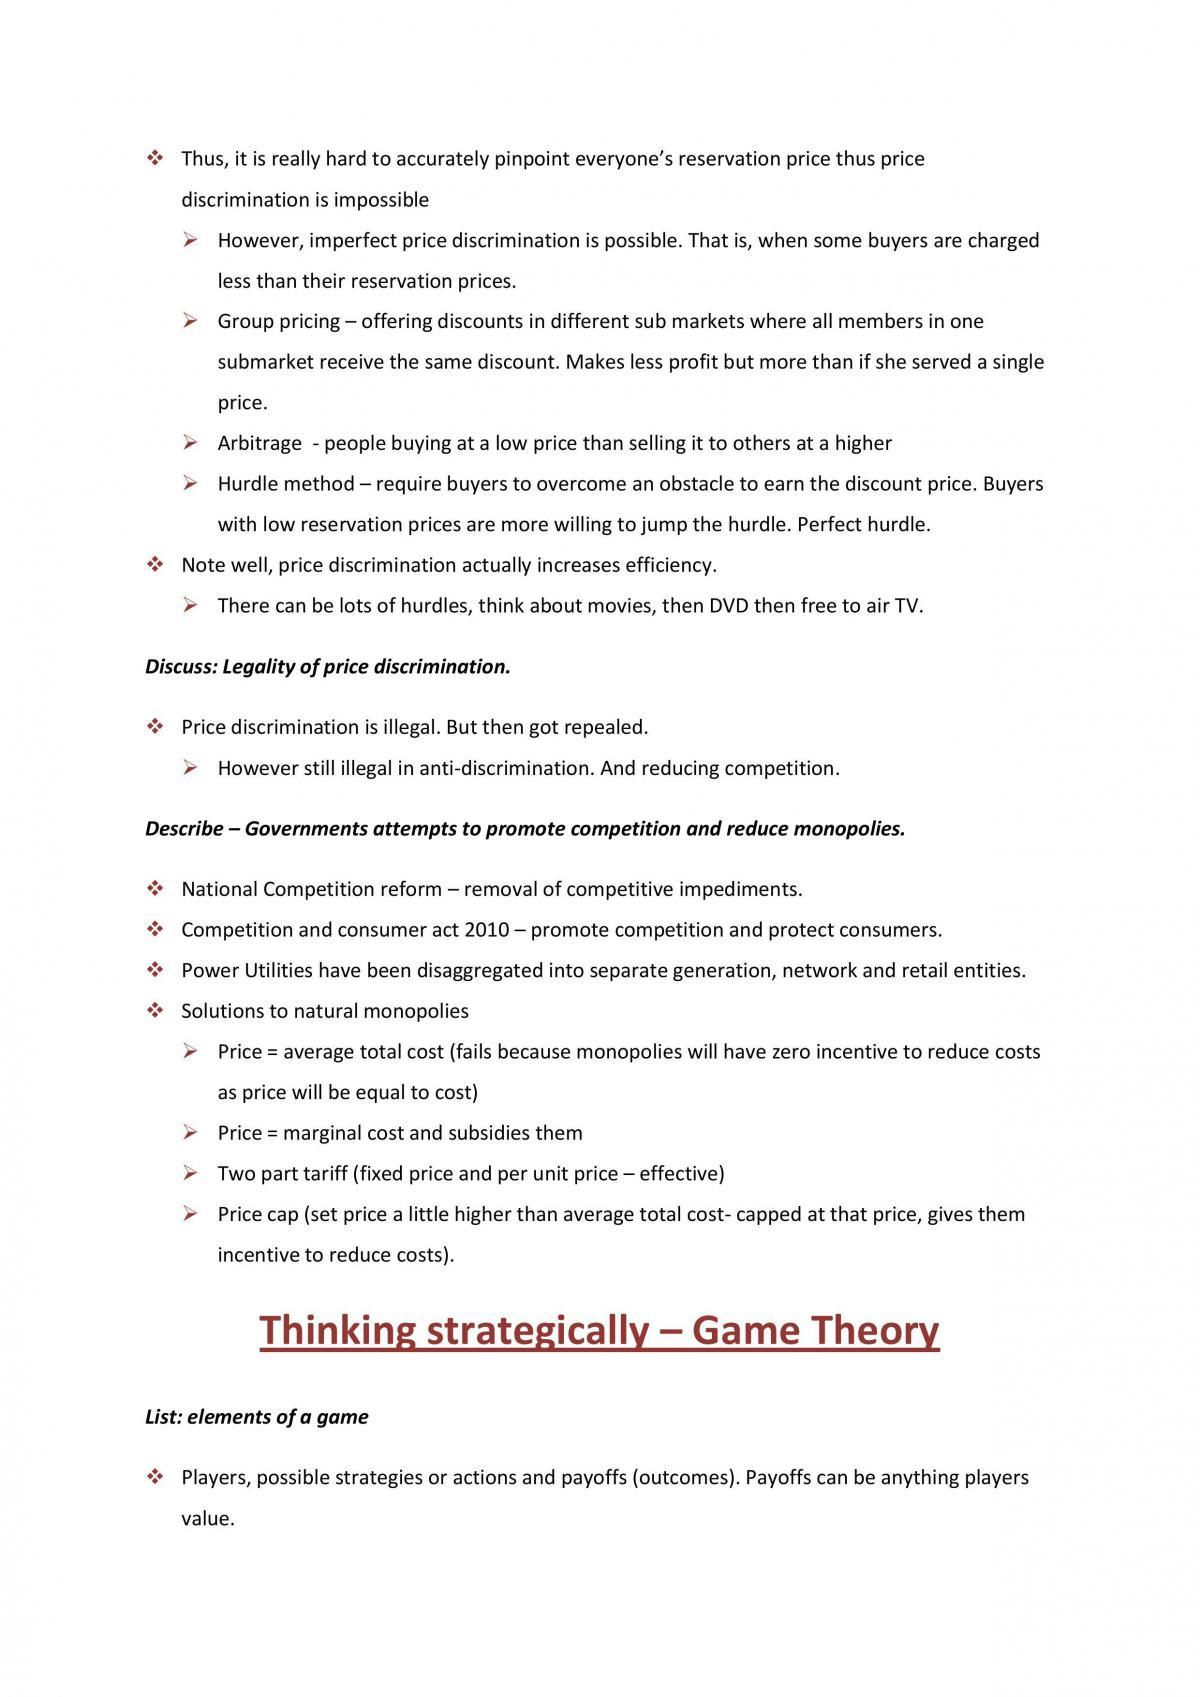 Microeconomics Notes  - Page 35